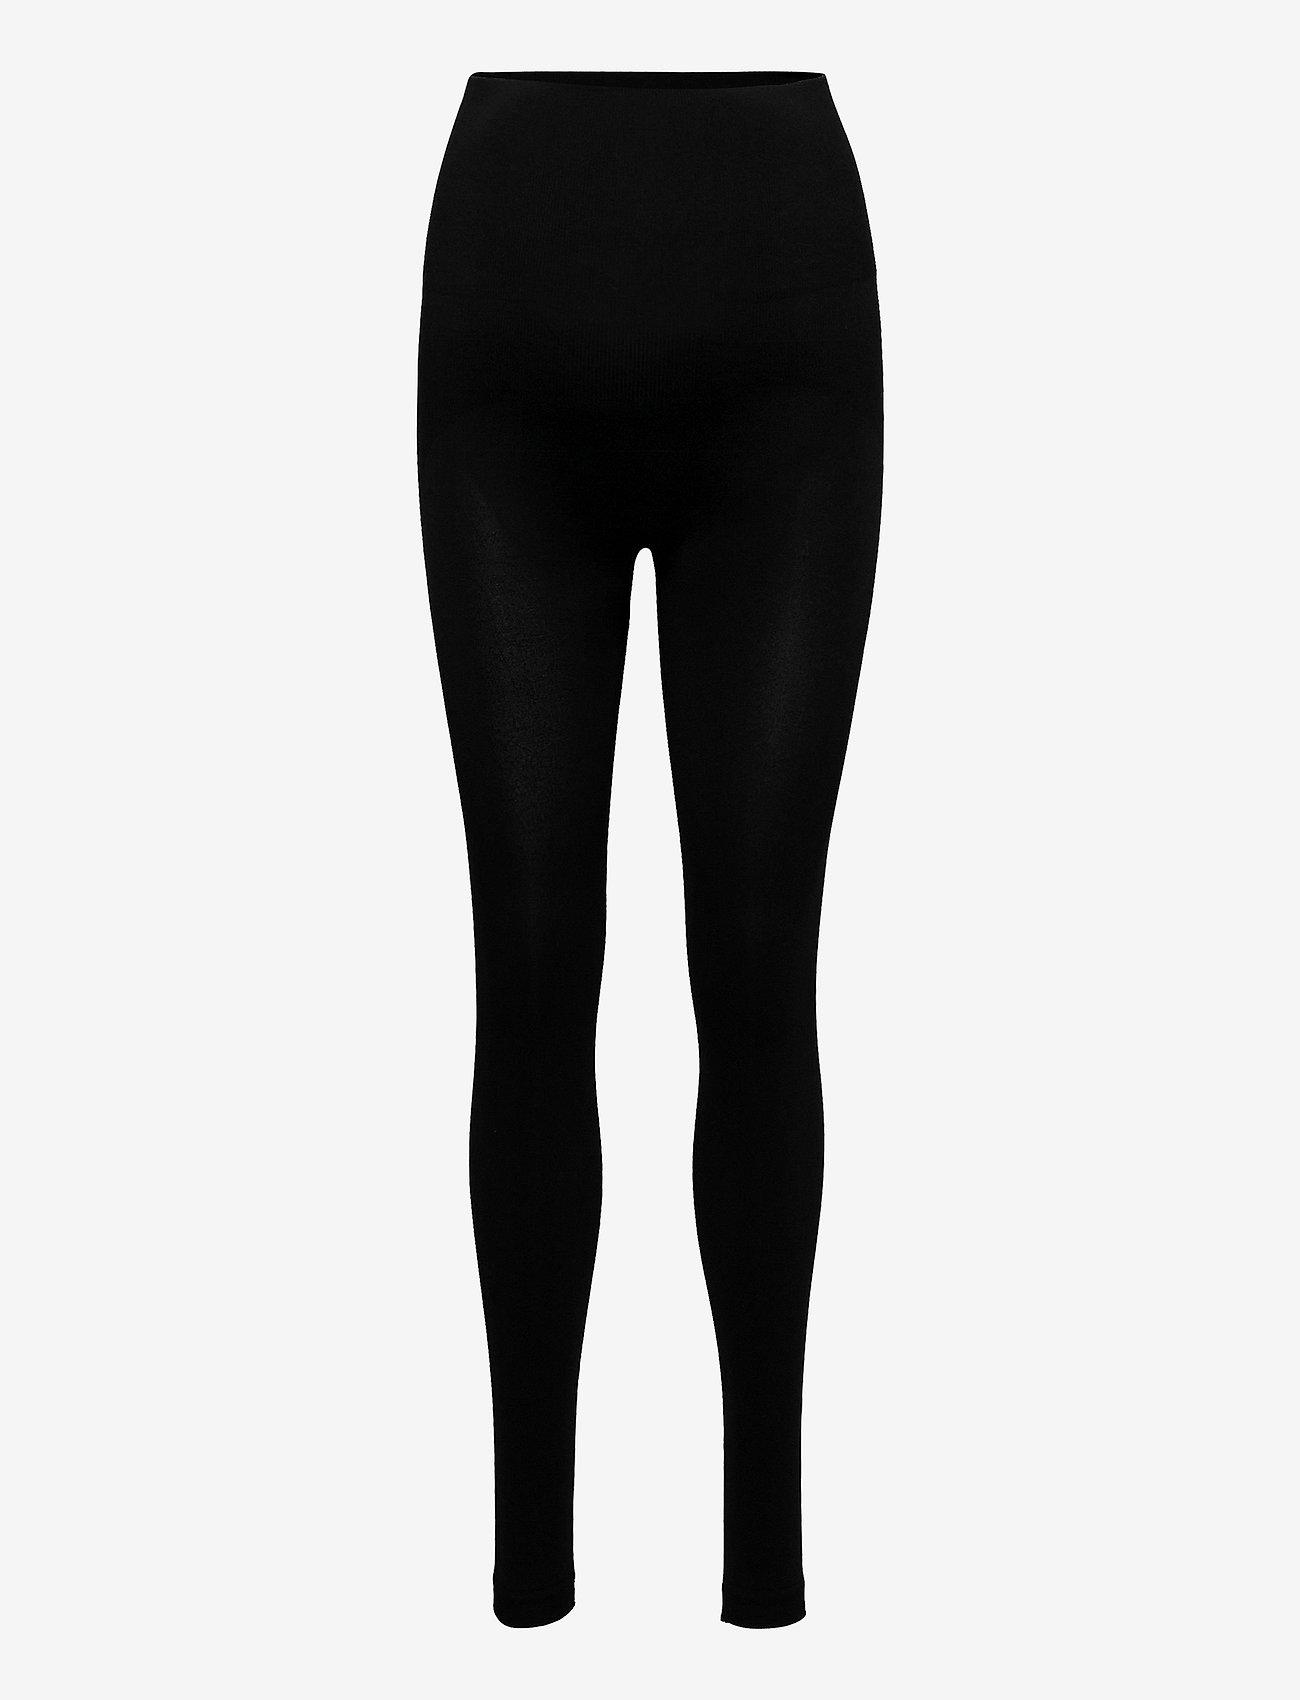 Boob - Support leggings - leggings - black - 0